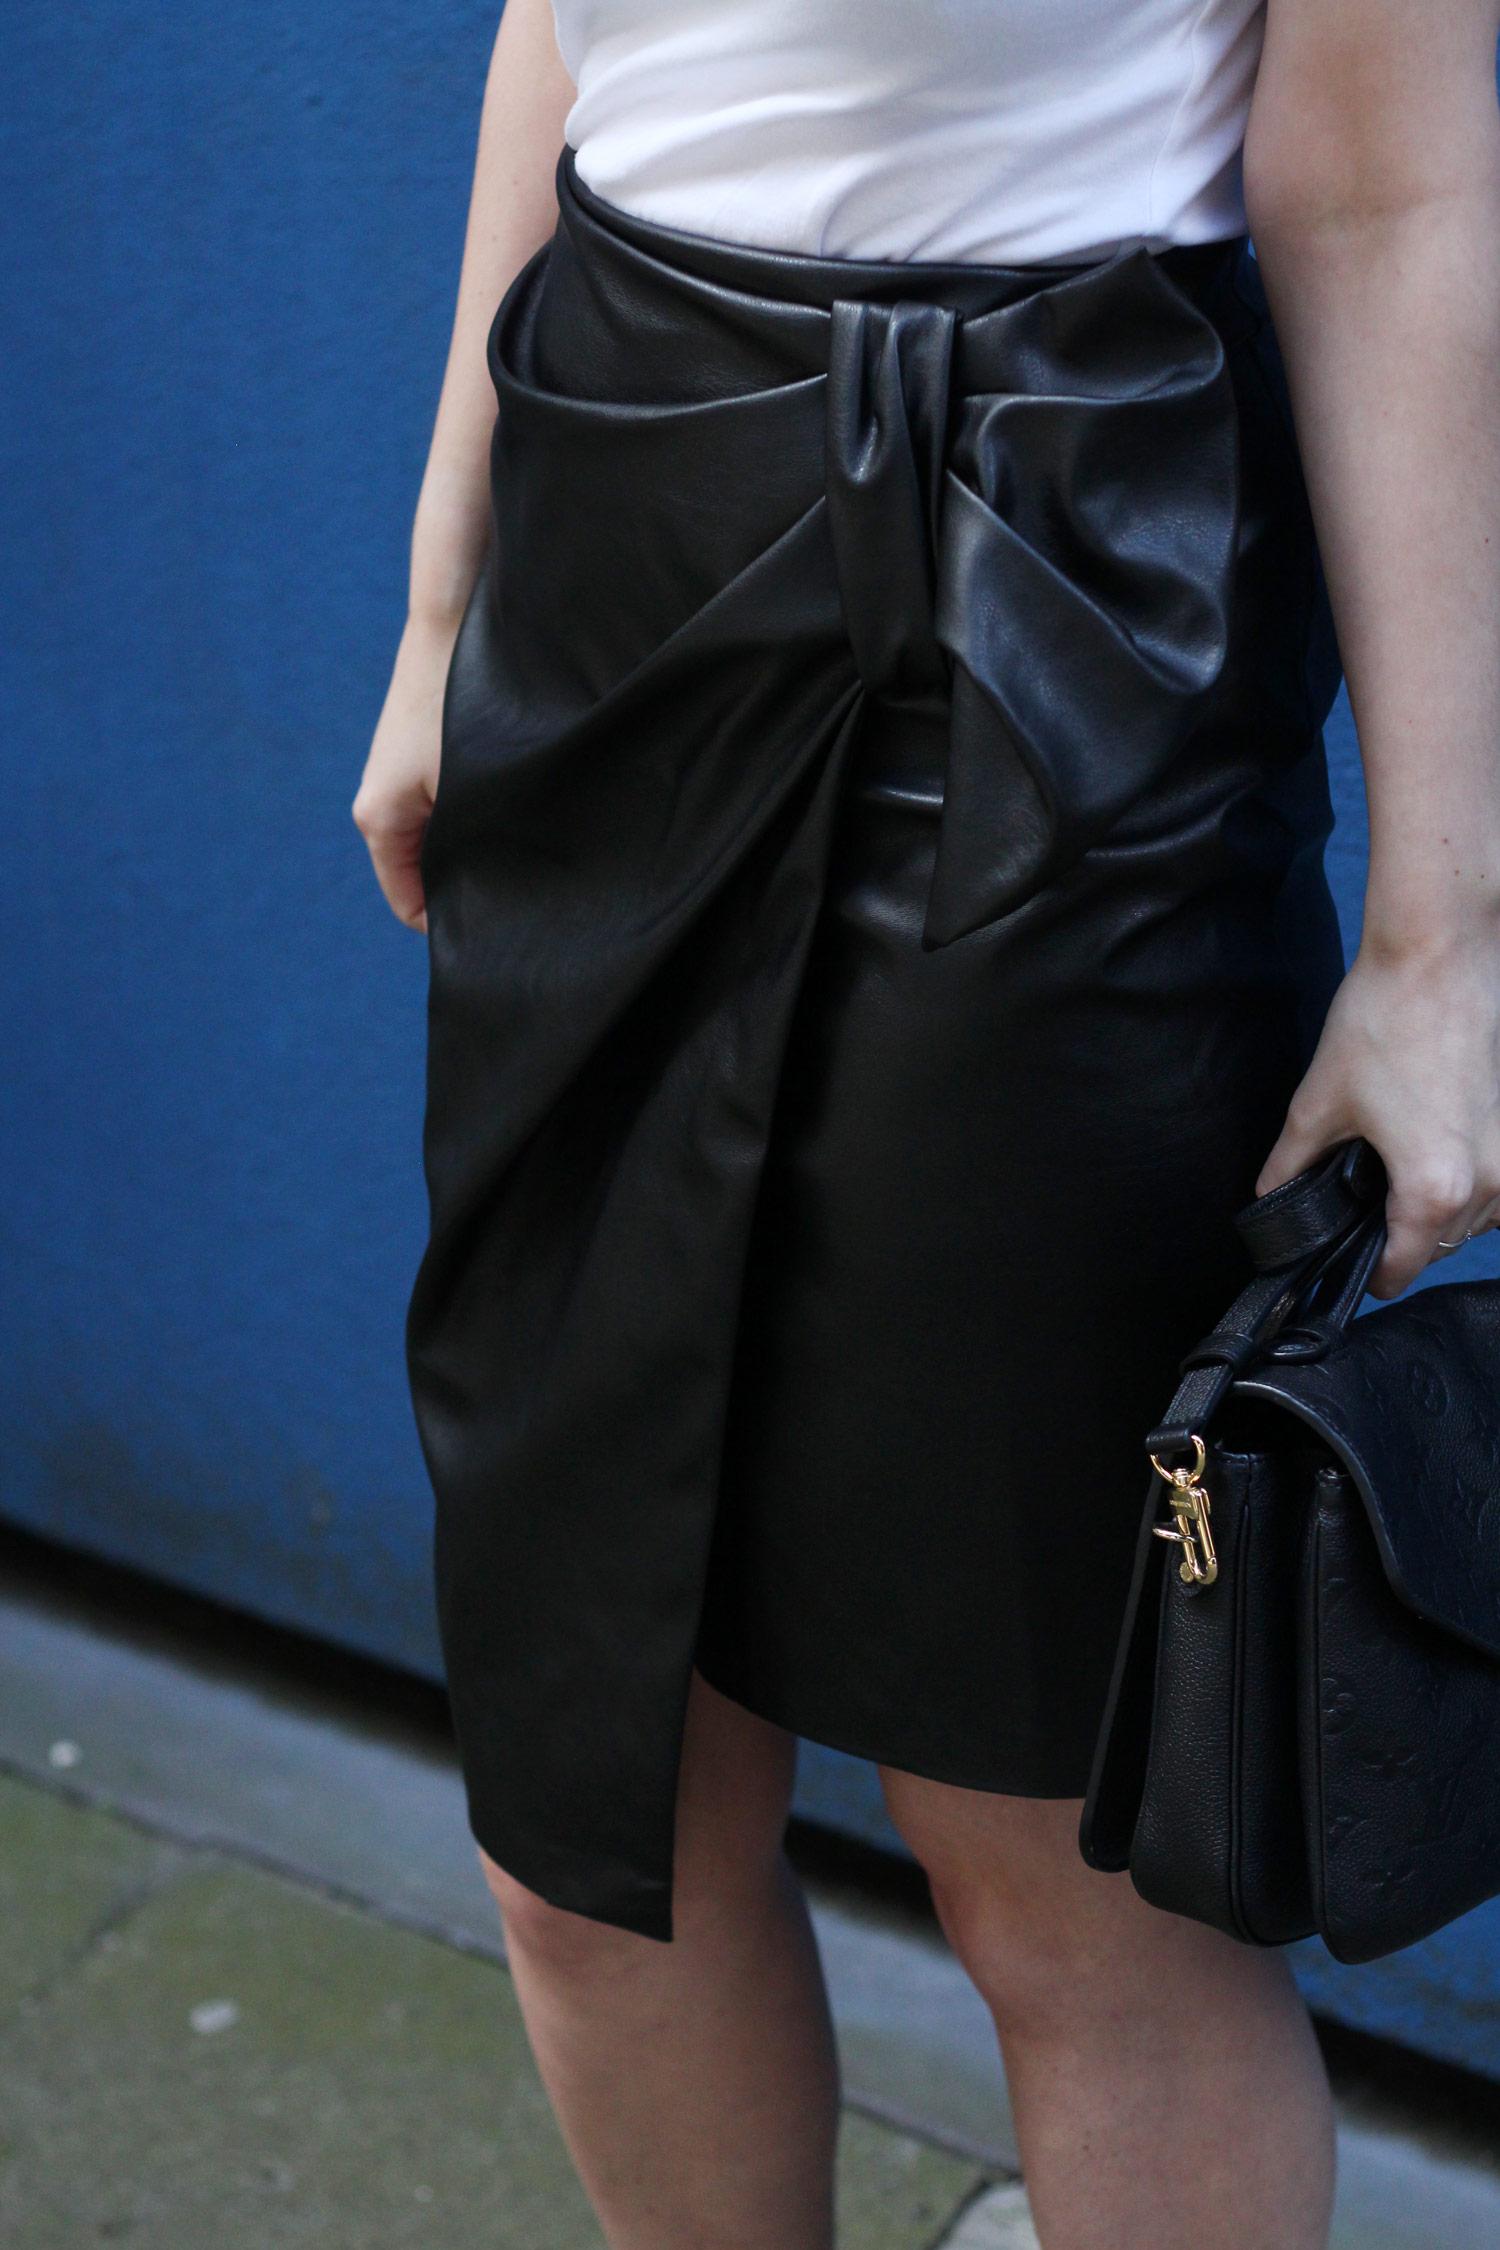 closet-london-leather-skirt-grey-cardgain-louis-vuitton-pochette-metis-14